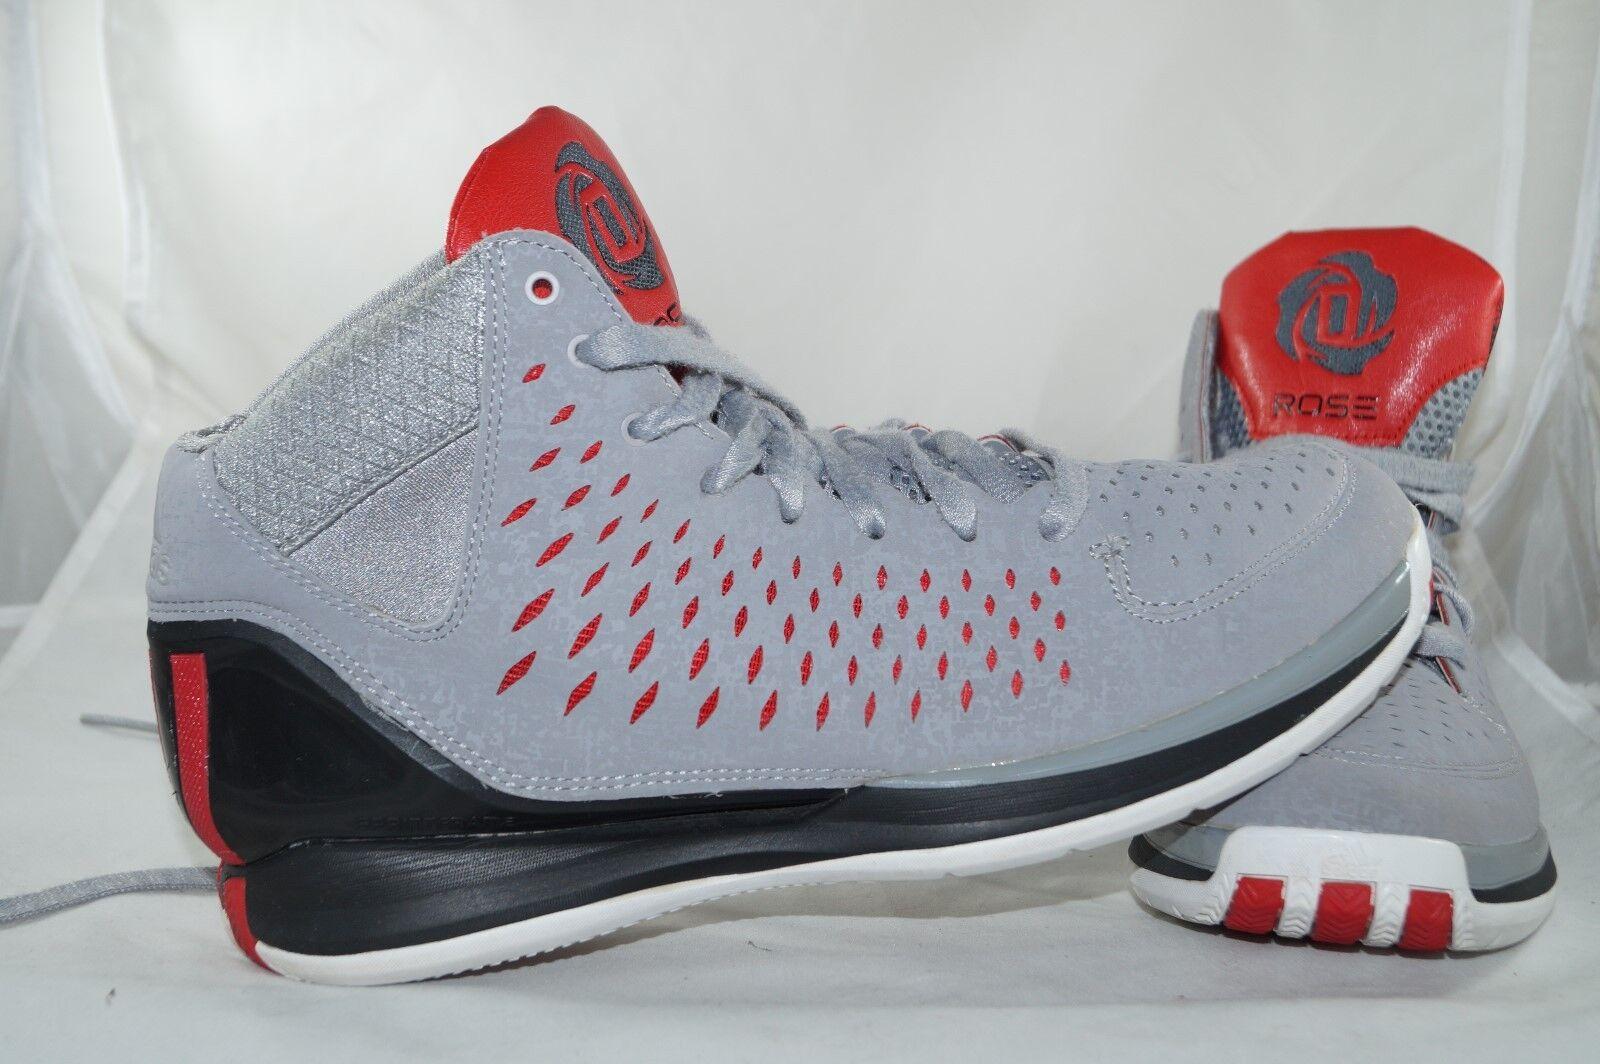 Adidas D Rose 3 Chicago Bulls High Tops Baskatball Gr: 43 1/3 Grau Sprint Frame